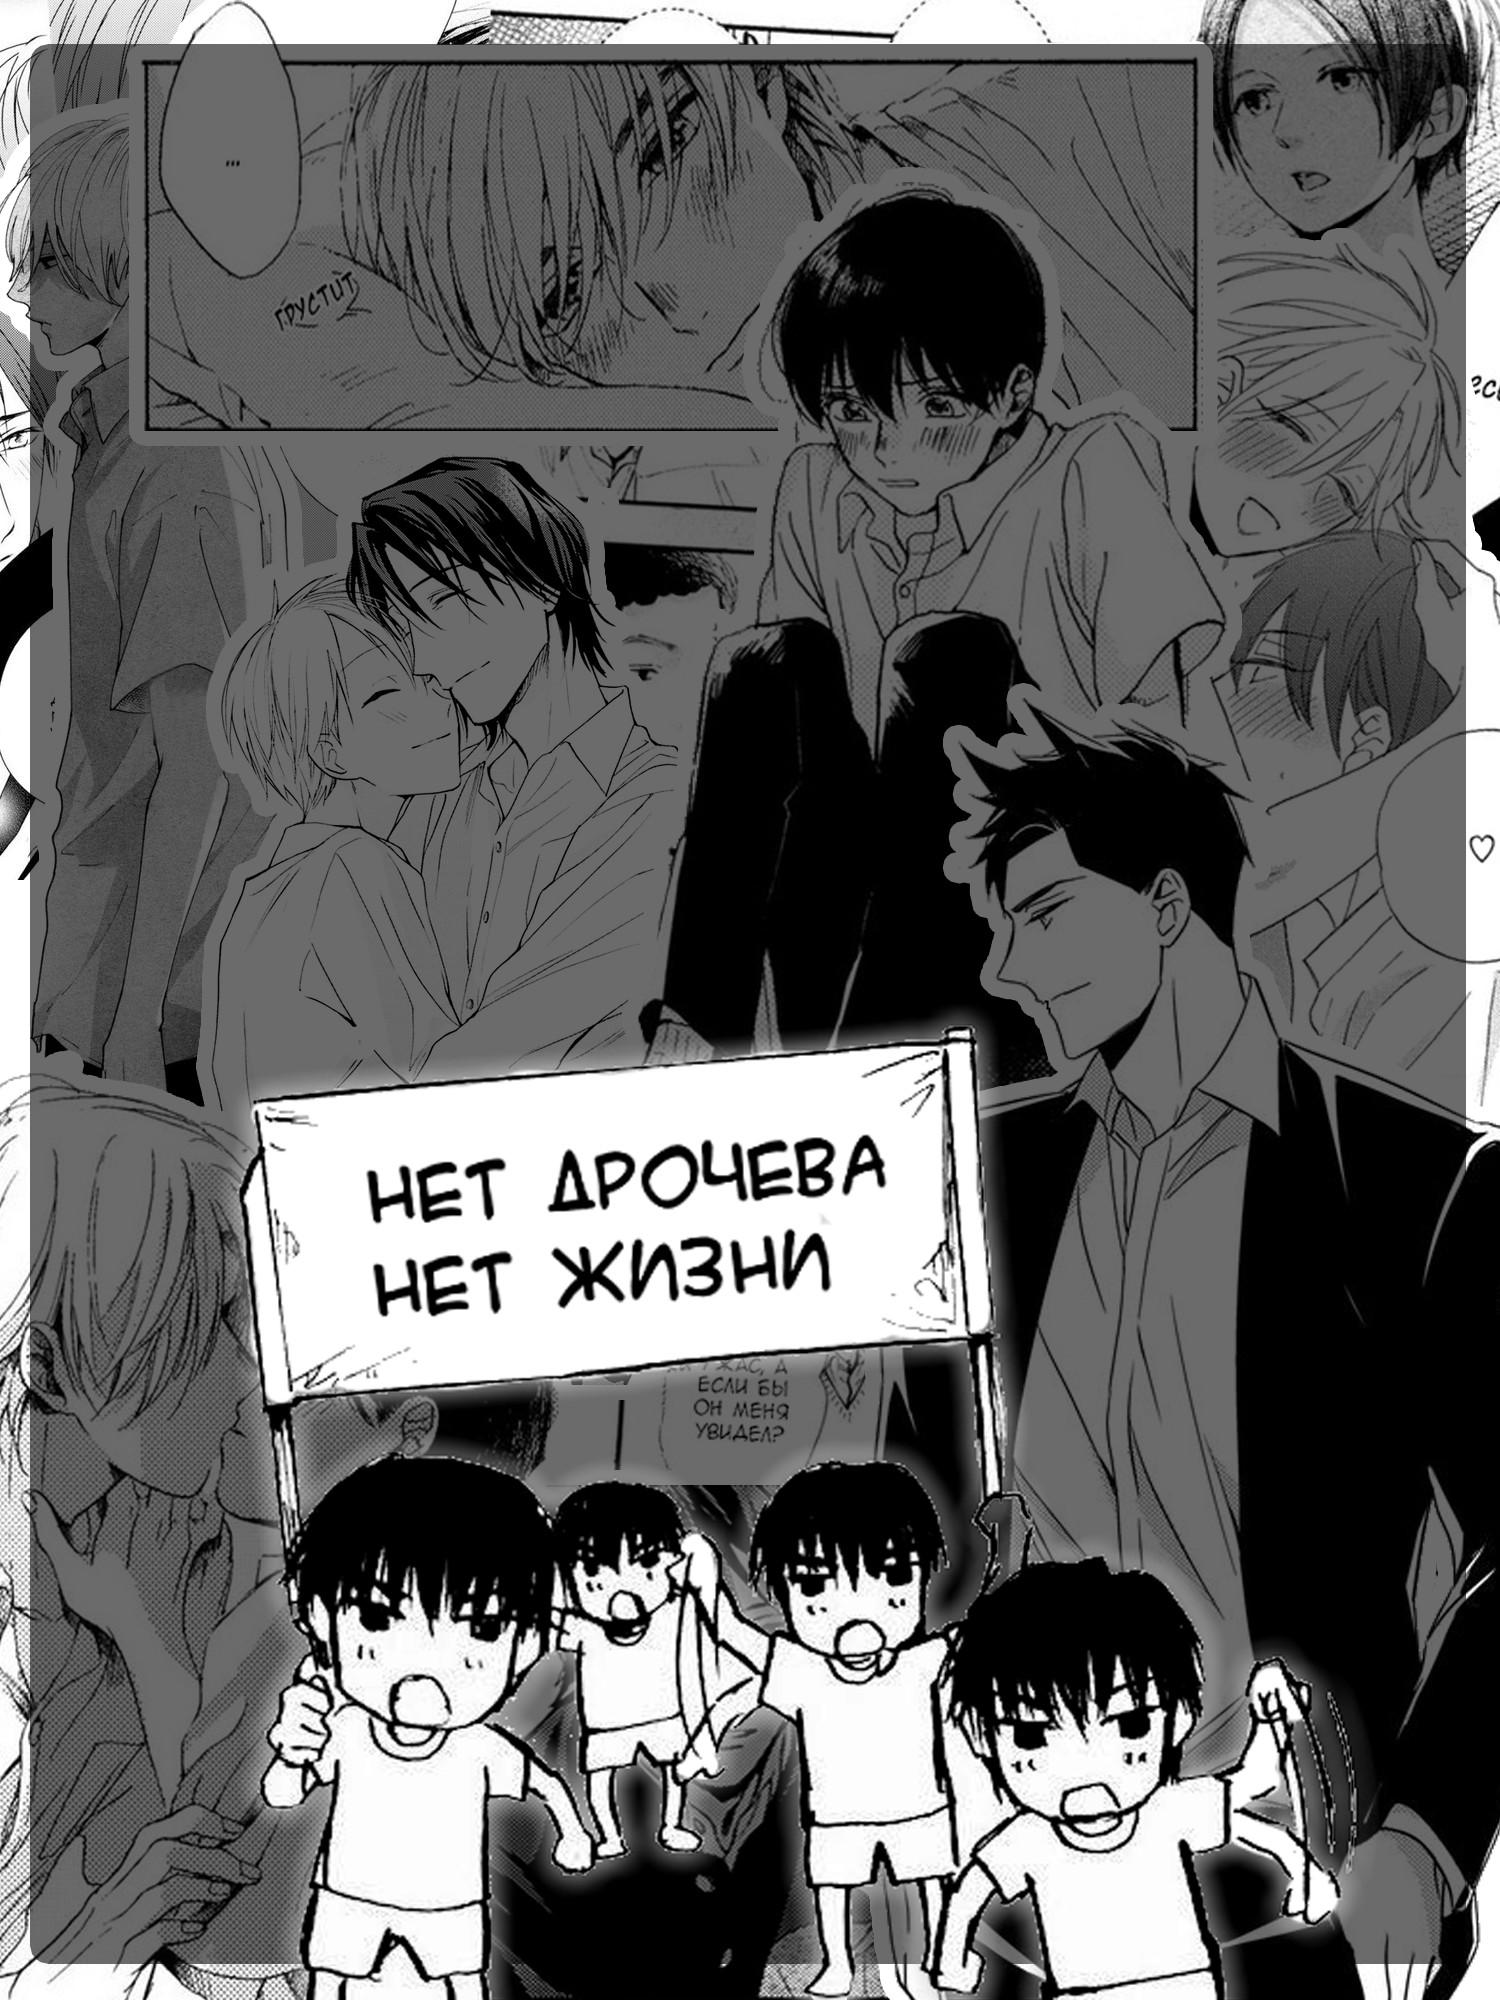 https://r2.ninemanga.com/comics/pic5/41/39081/1472201/1565027360719.jpg Page 1